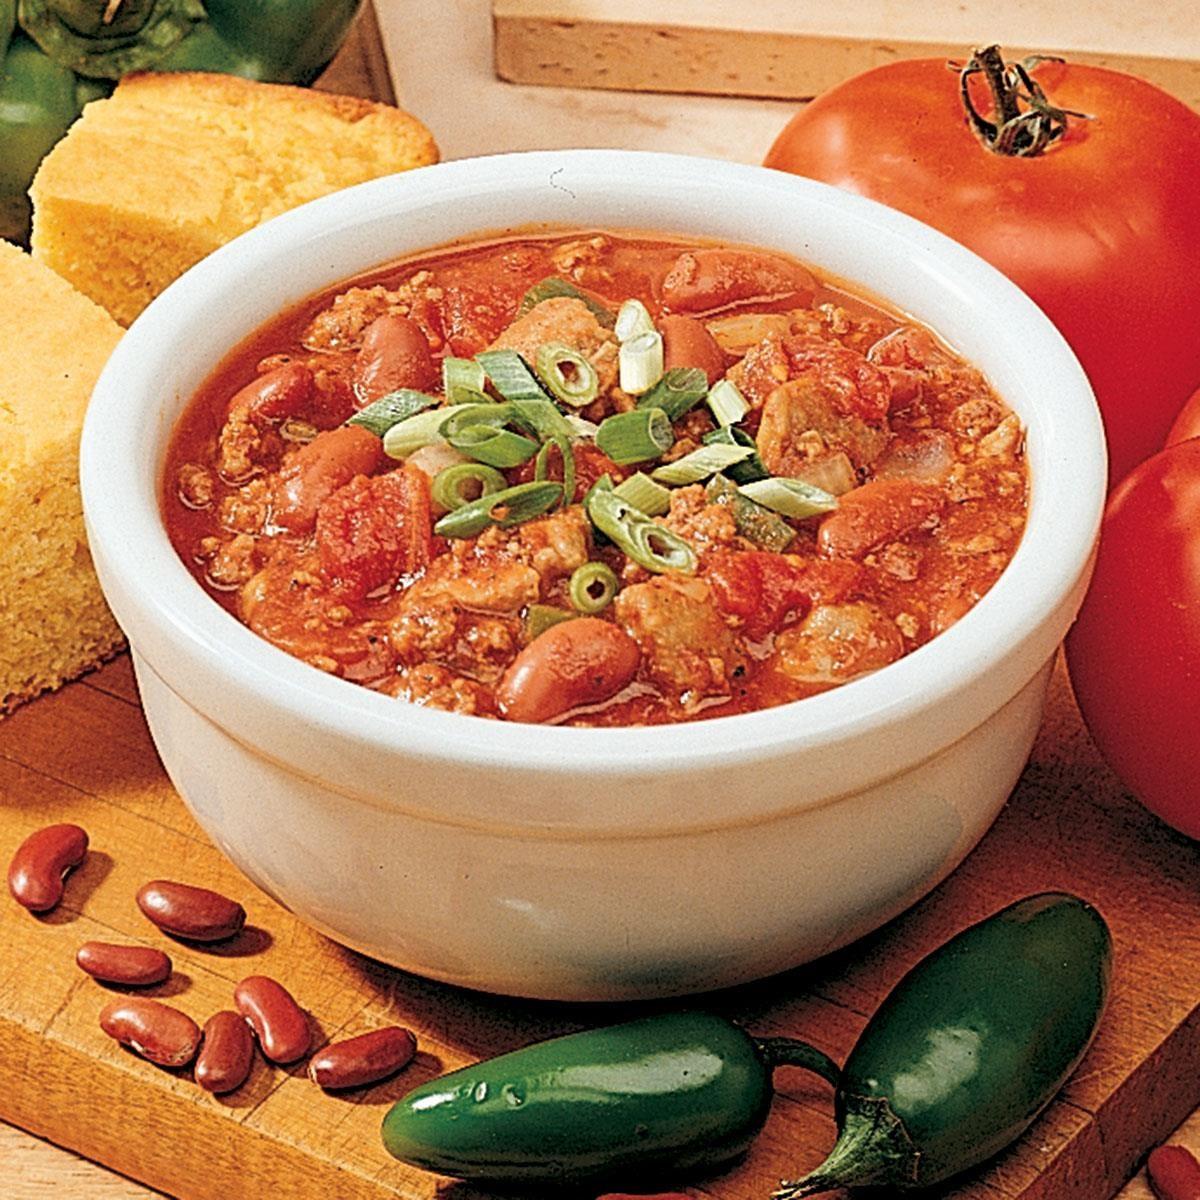 Zesty Colorado Chili Recipe